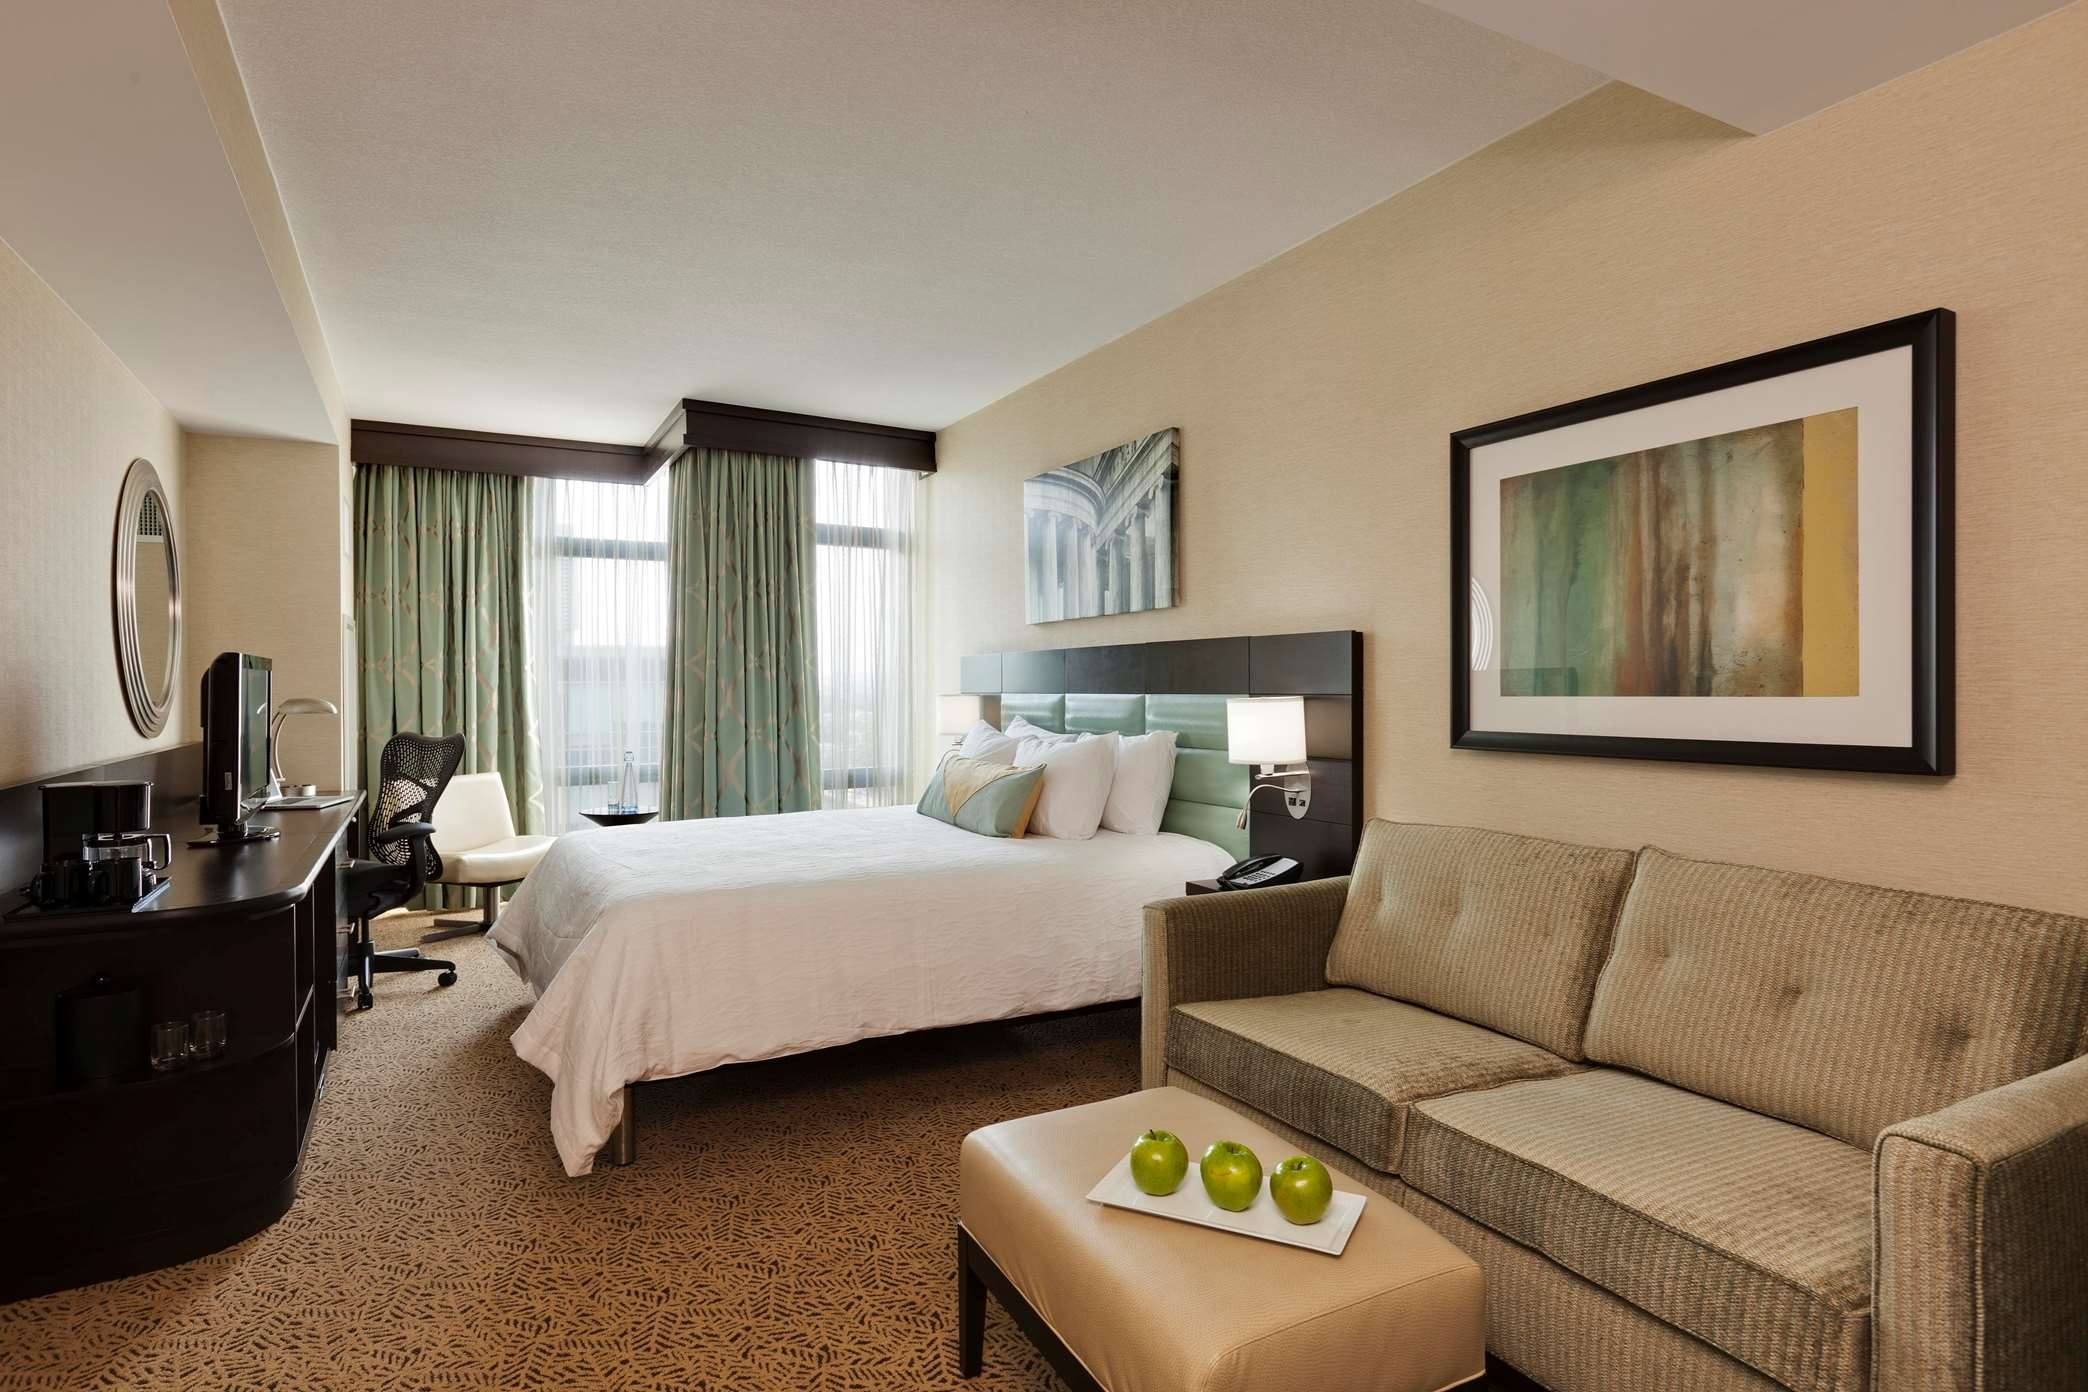 Hilton Garden Inn Washington DC/U.S. Capitol image 8